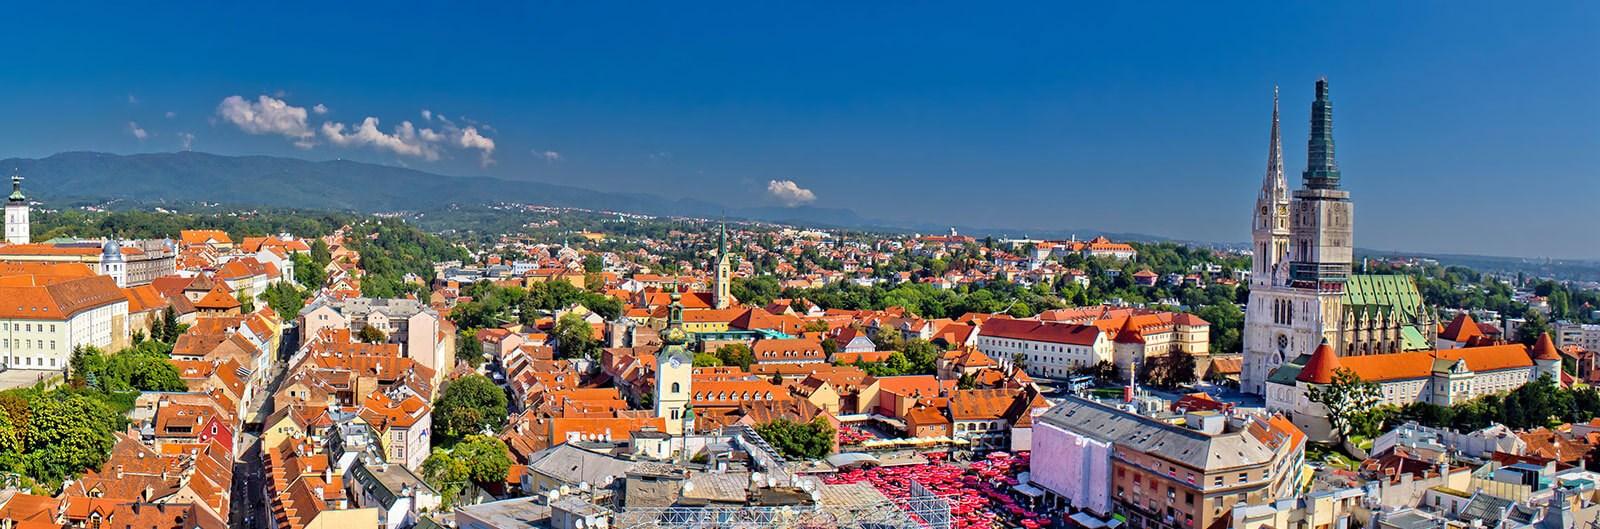 Autobusni Kolodvor Zagreb Online Karte Za Autobus Autobusni